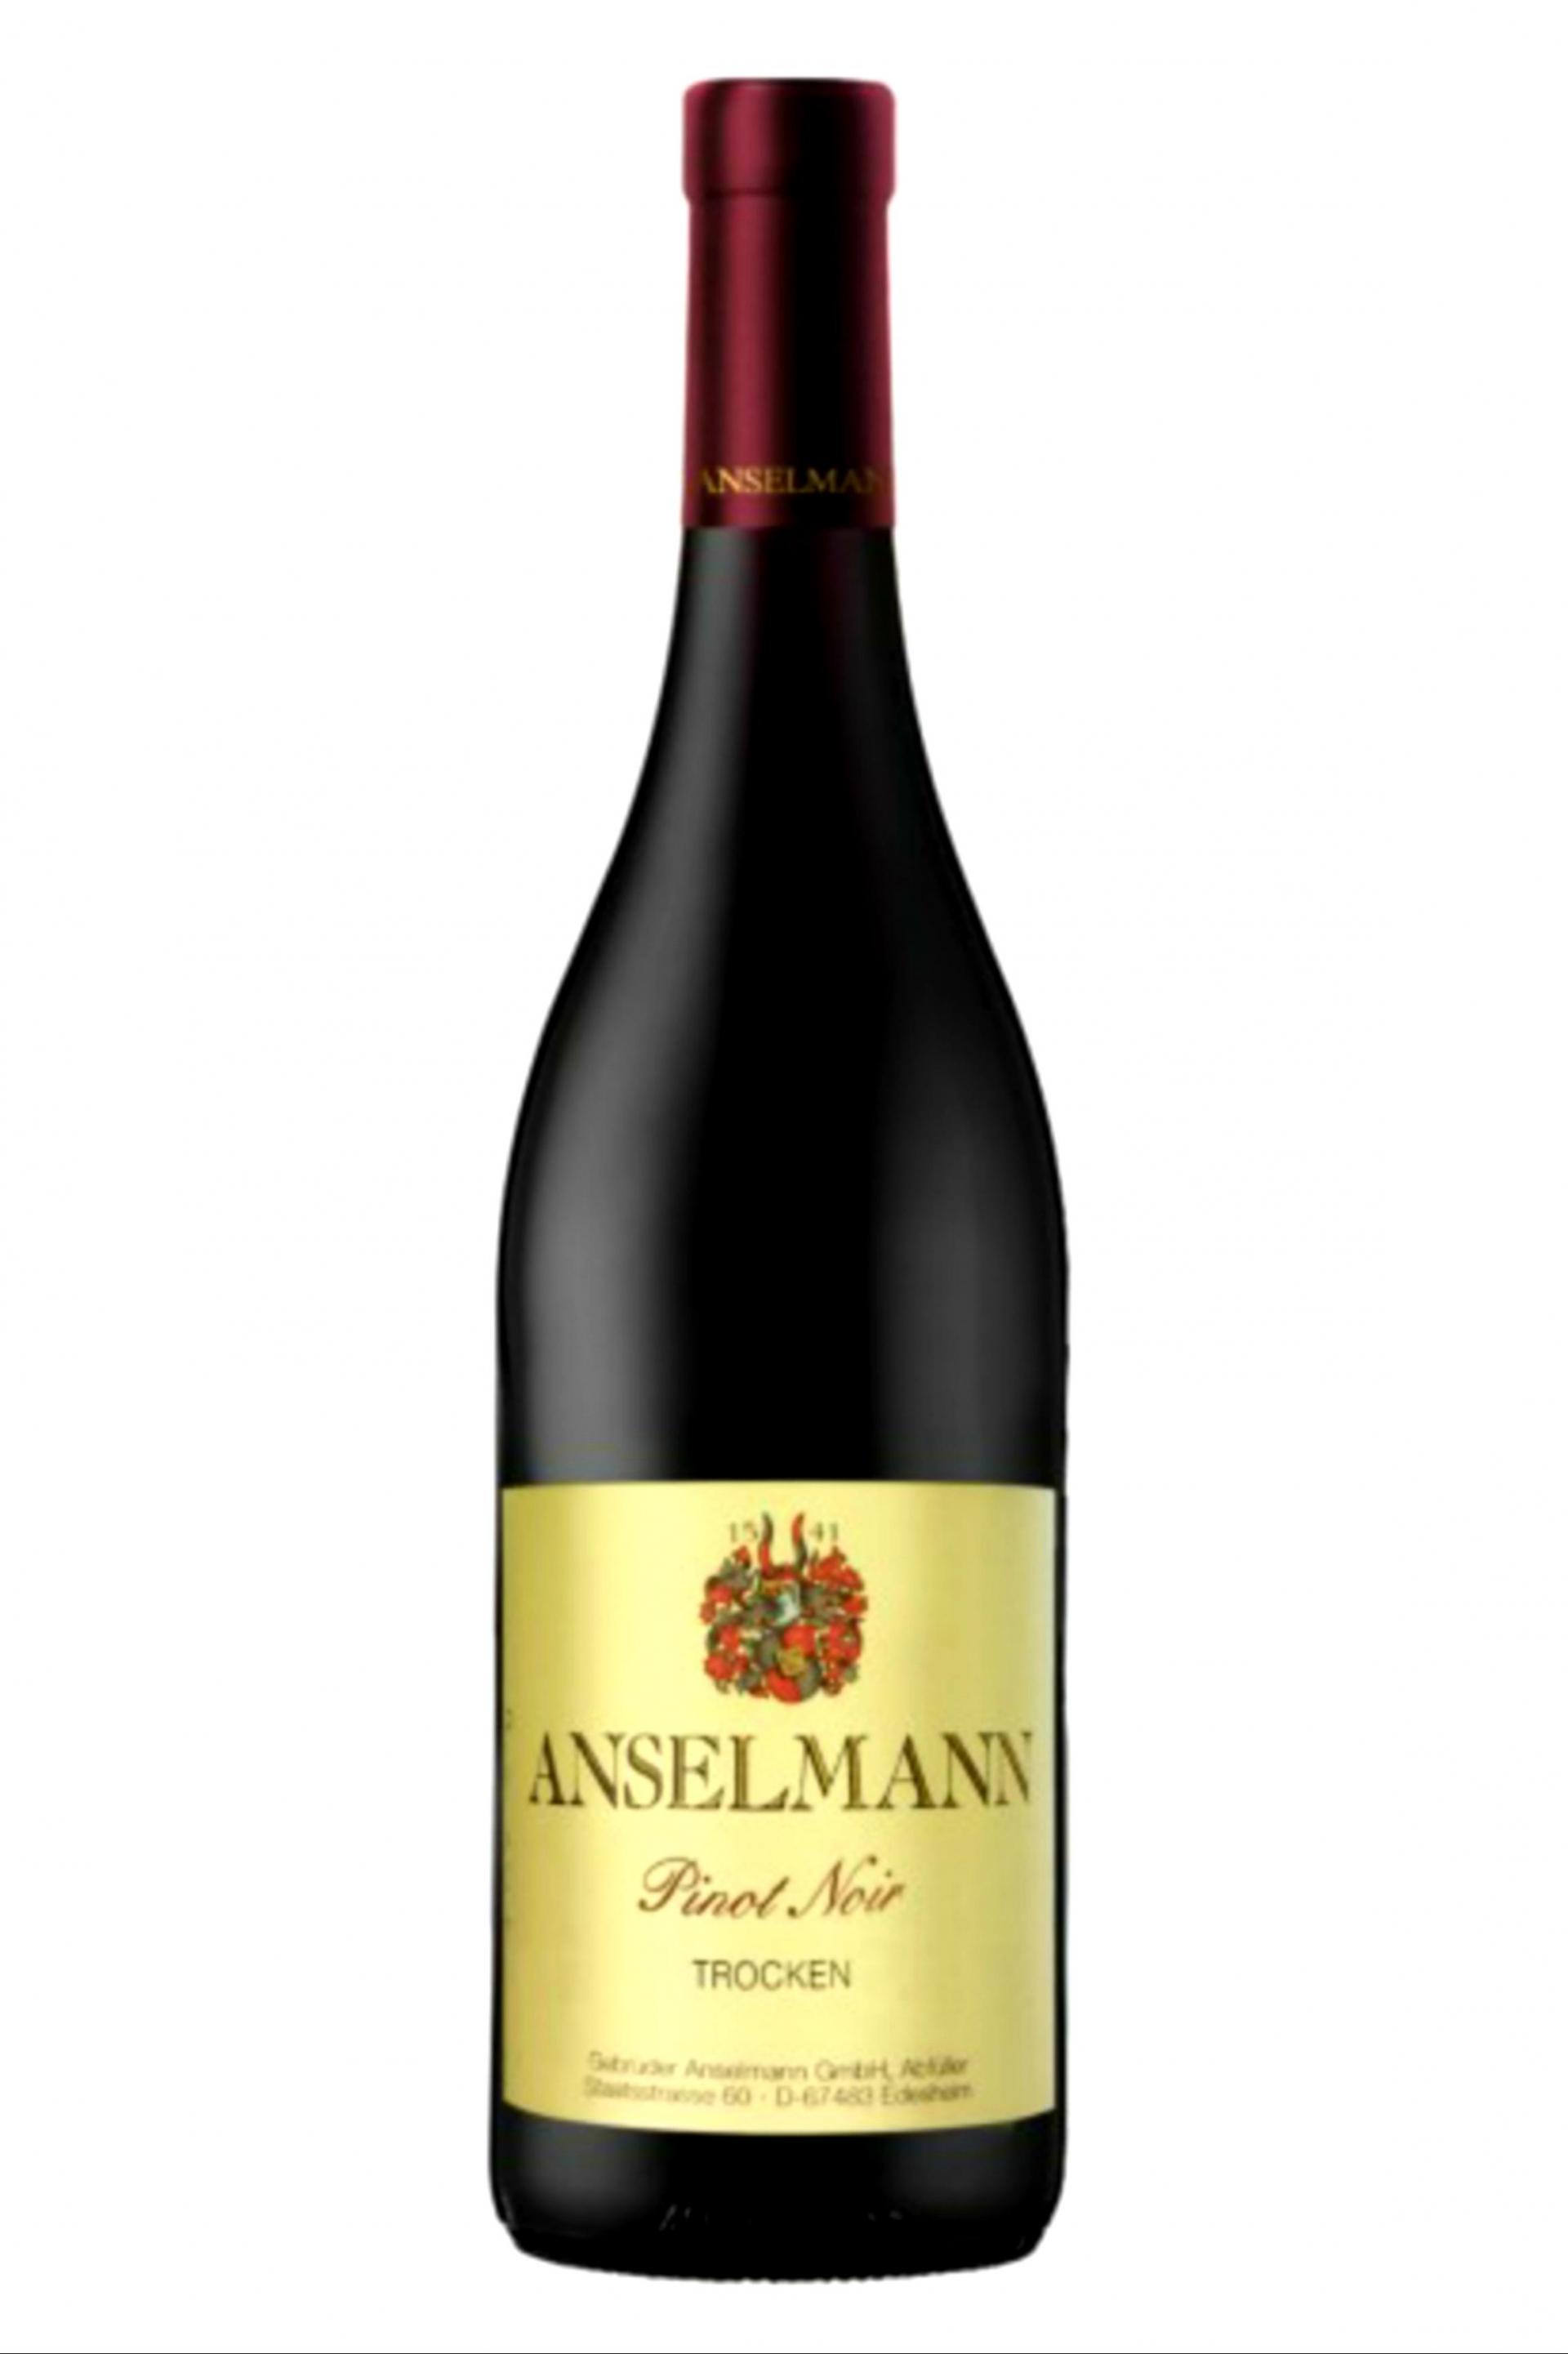 Anselmann Pinot Noir Spätburgunder Trocken 750ml